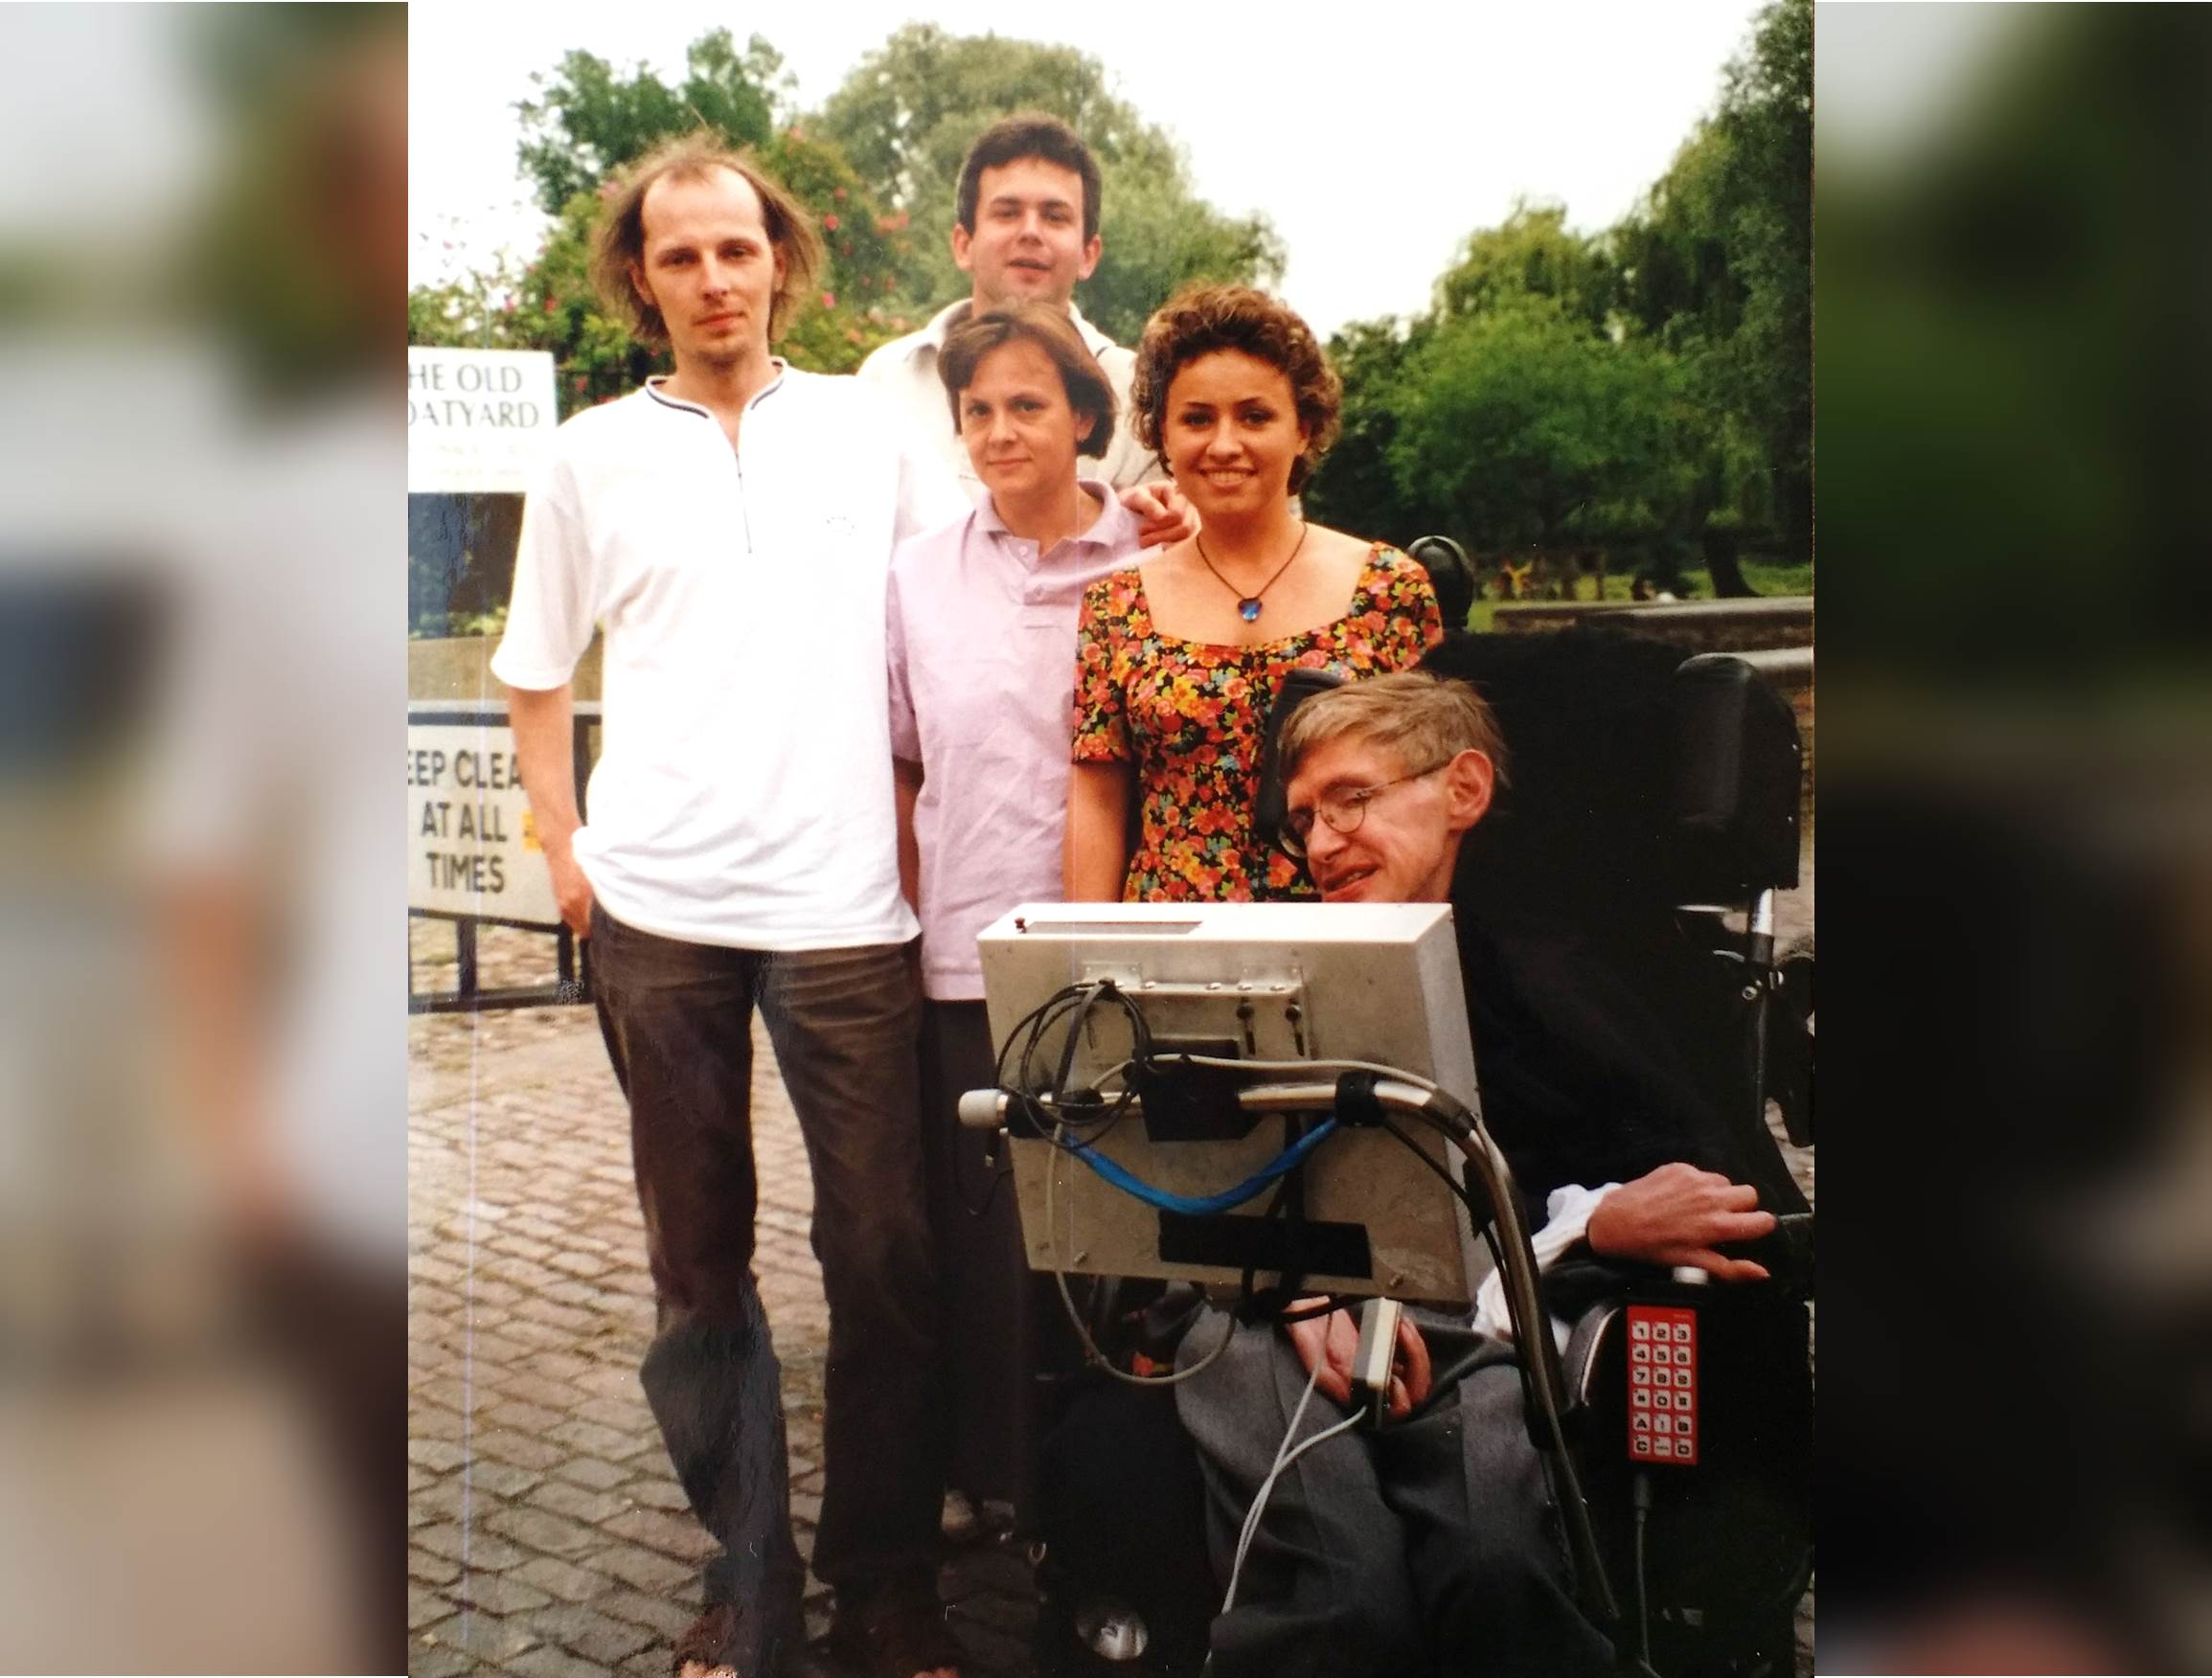 Aneta Czerska & Stephen Hawking w Cambridge